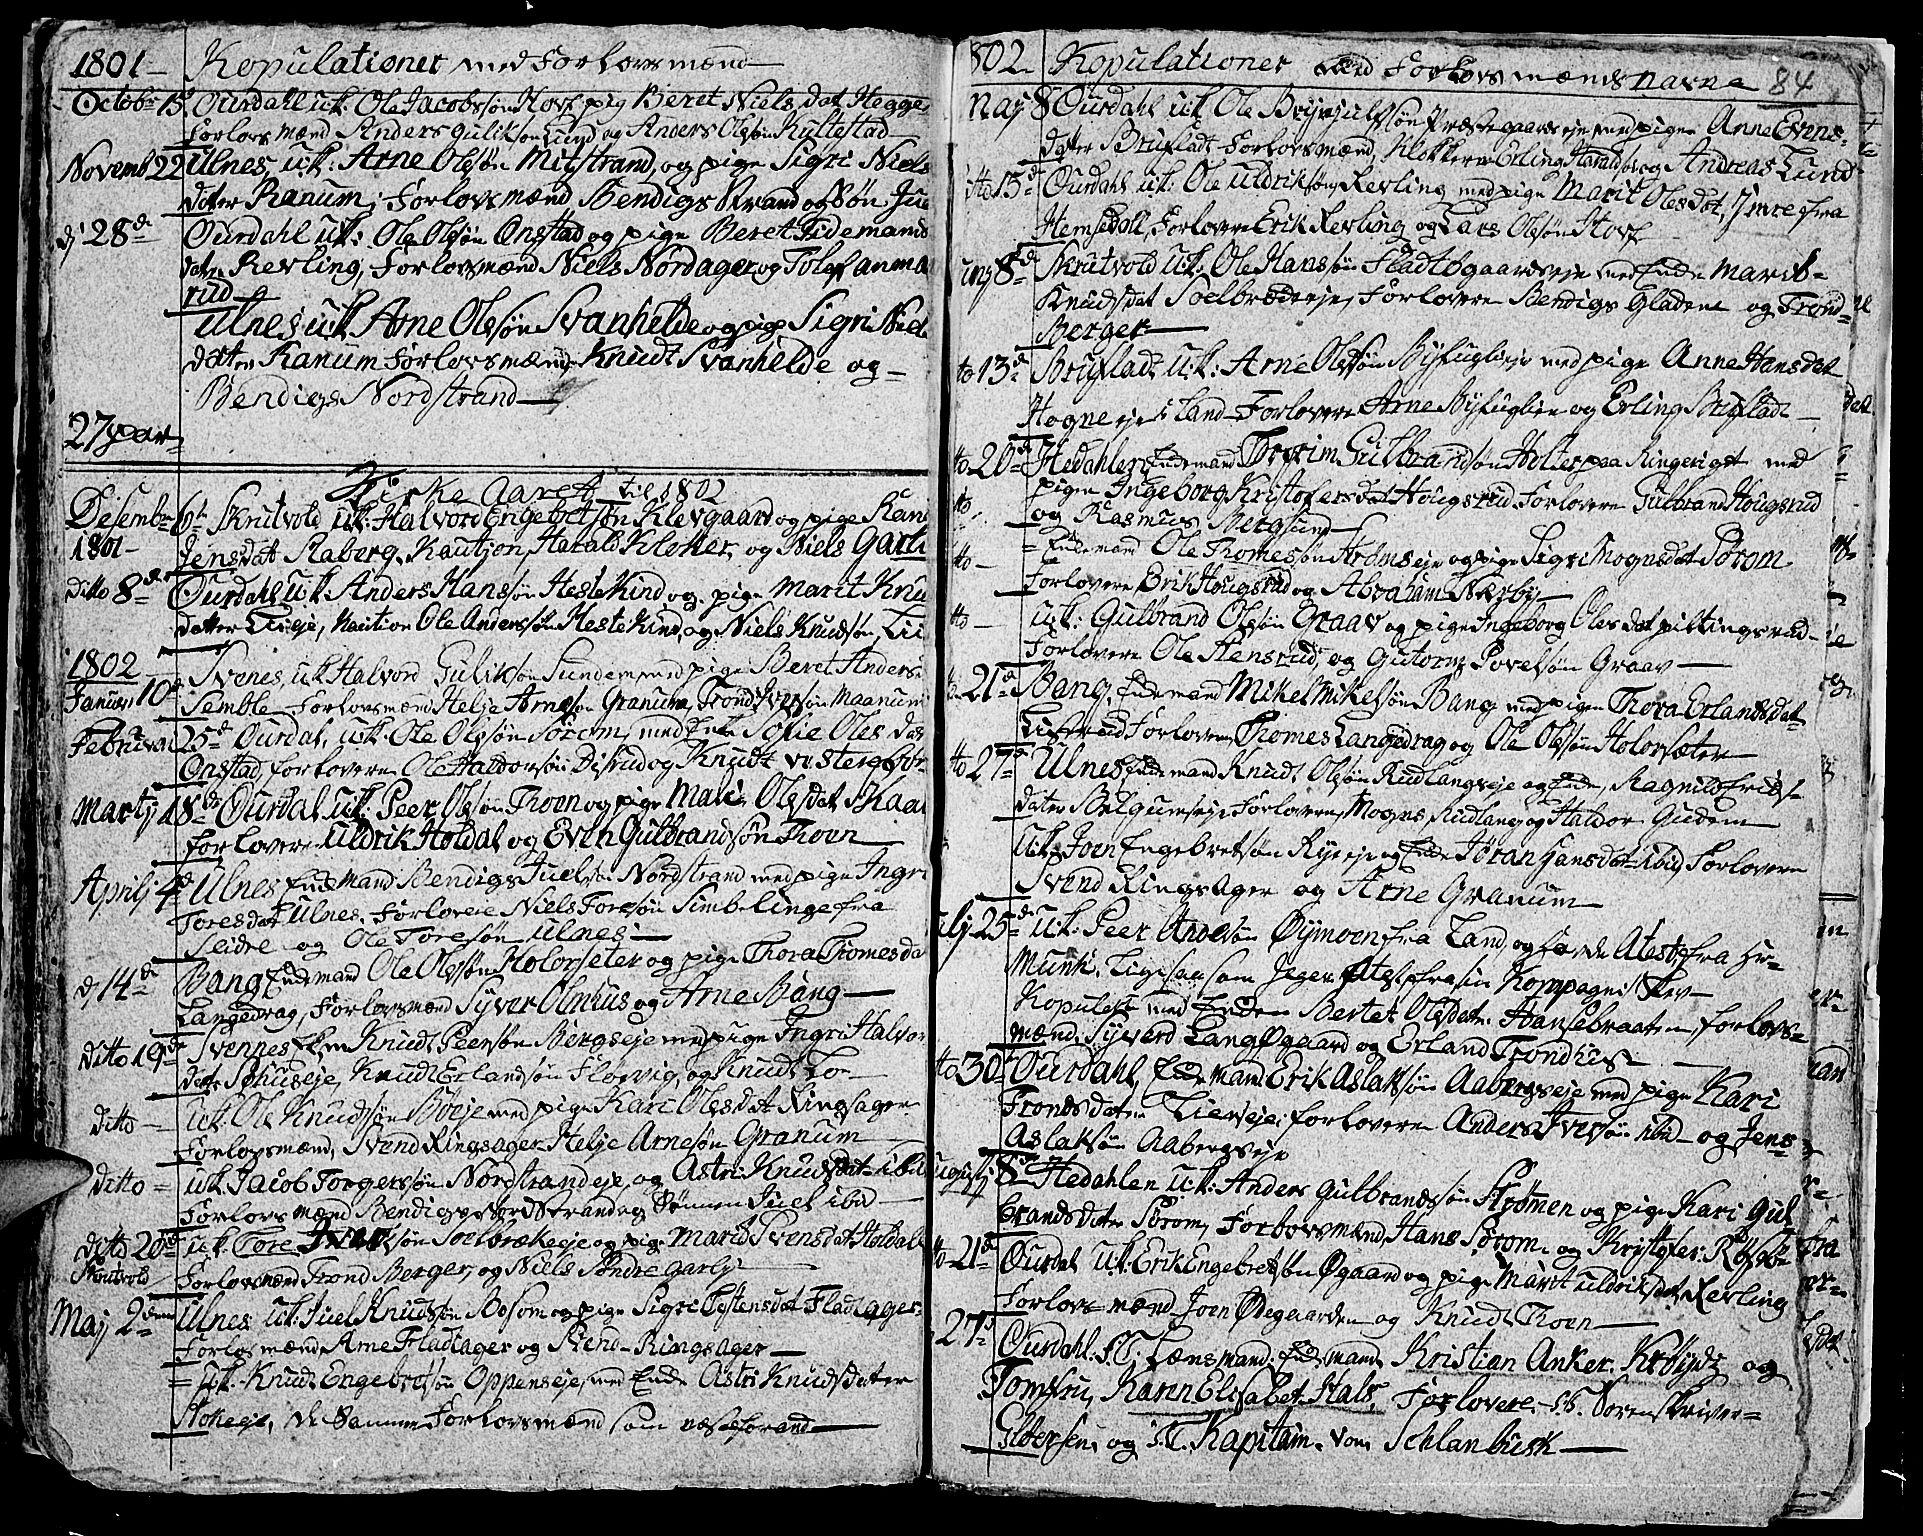 SAH, Aurdal prestekontor, Ministerialbok nr. 7, 1800-1808, s. 84